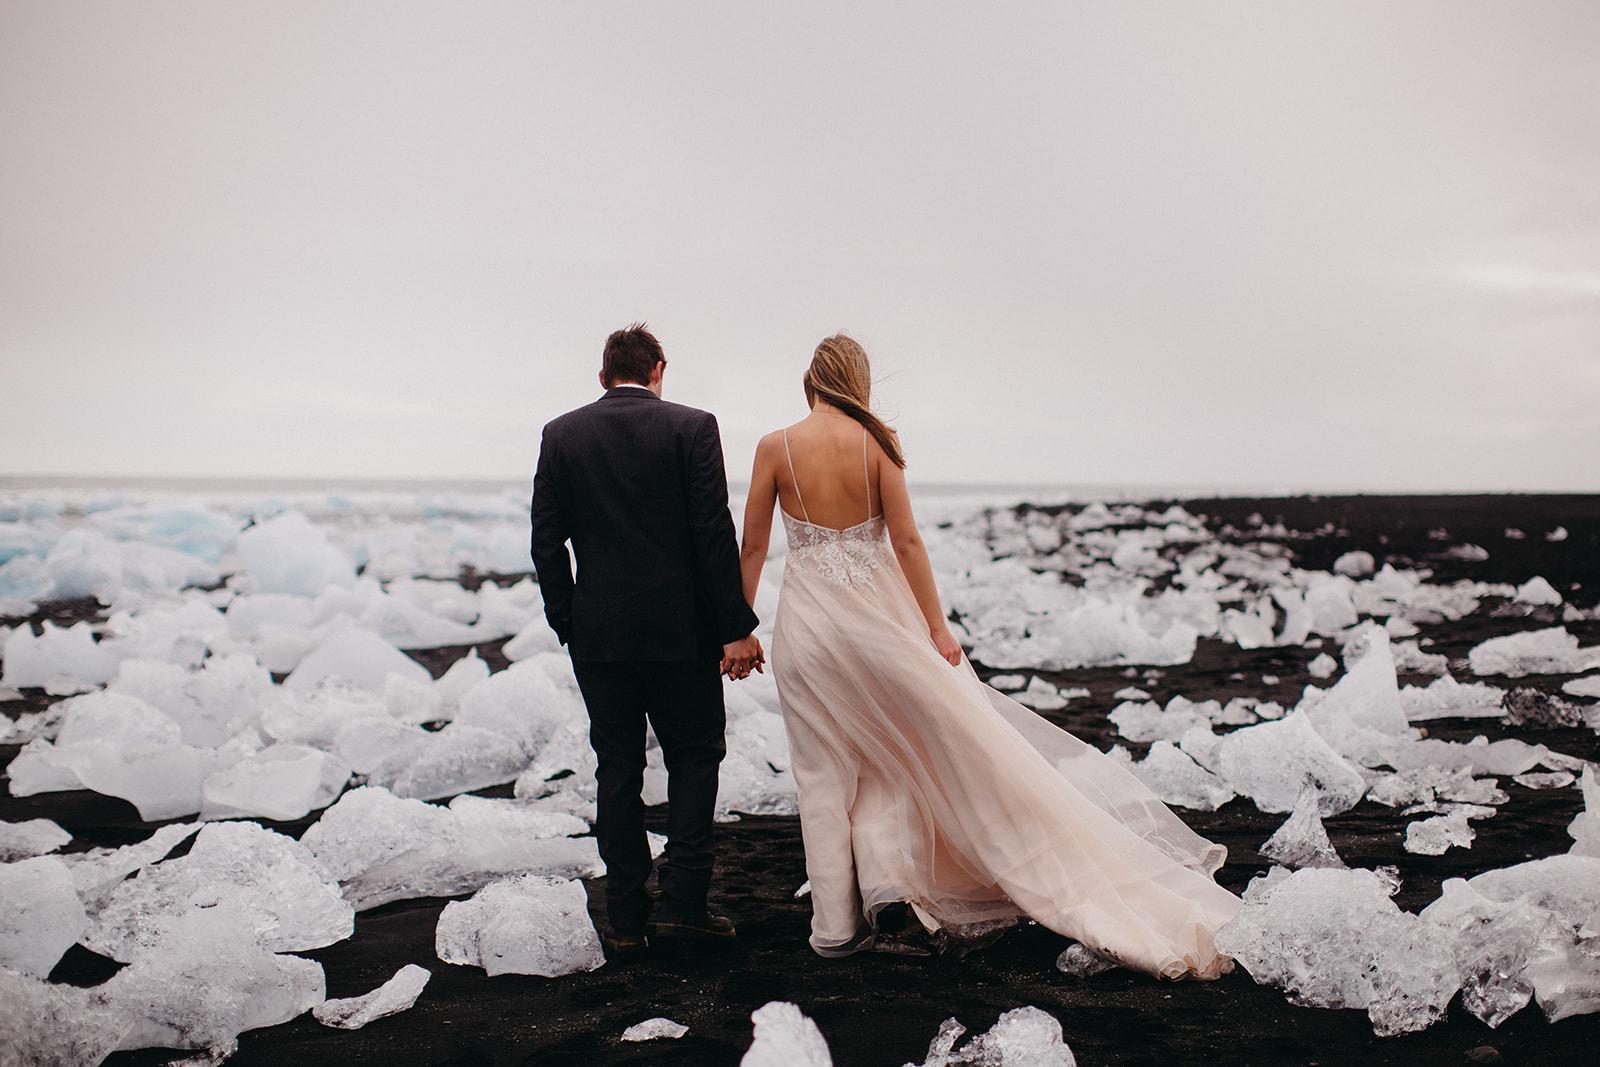 Icelandic Iceland Elopement Wedding Elope Photographer Eloping Reykjavík Vik Black Sand Beach Jökulsárlón Skogafoss Waterfall Vestrahorn Mountain Liz Osban Photography Destination 58.jpg